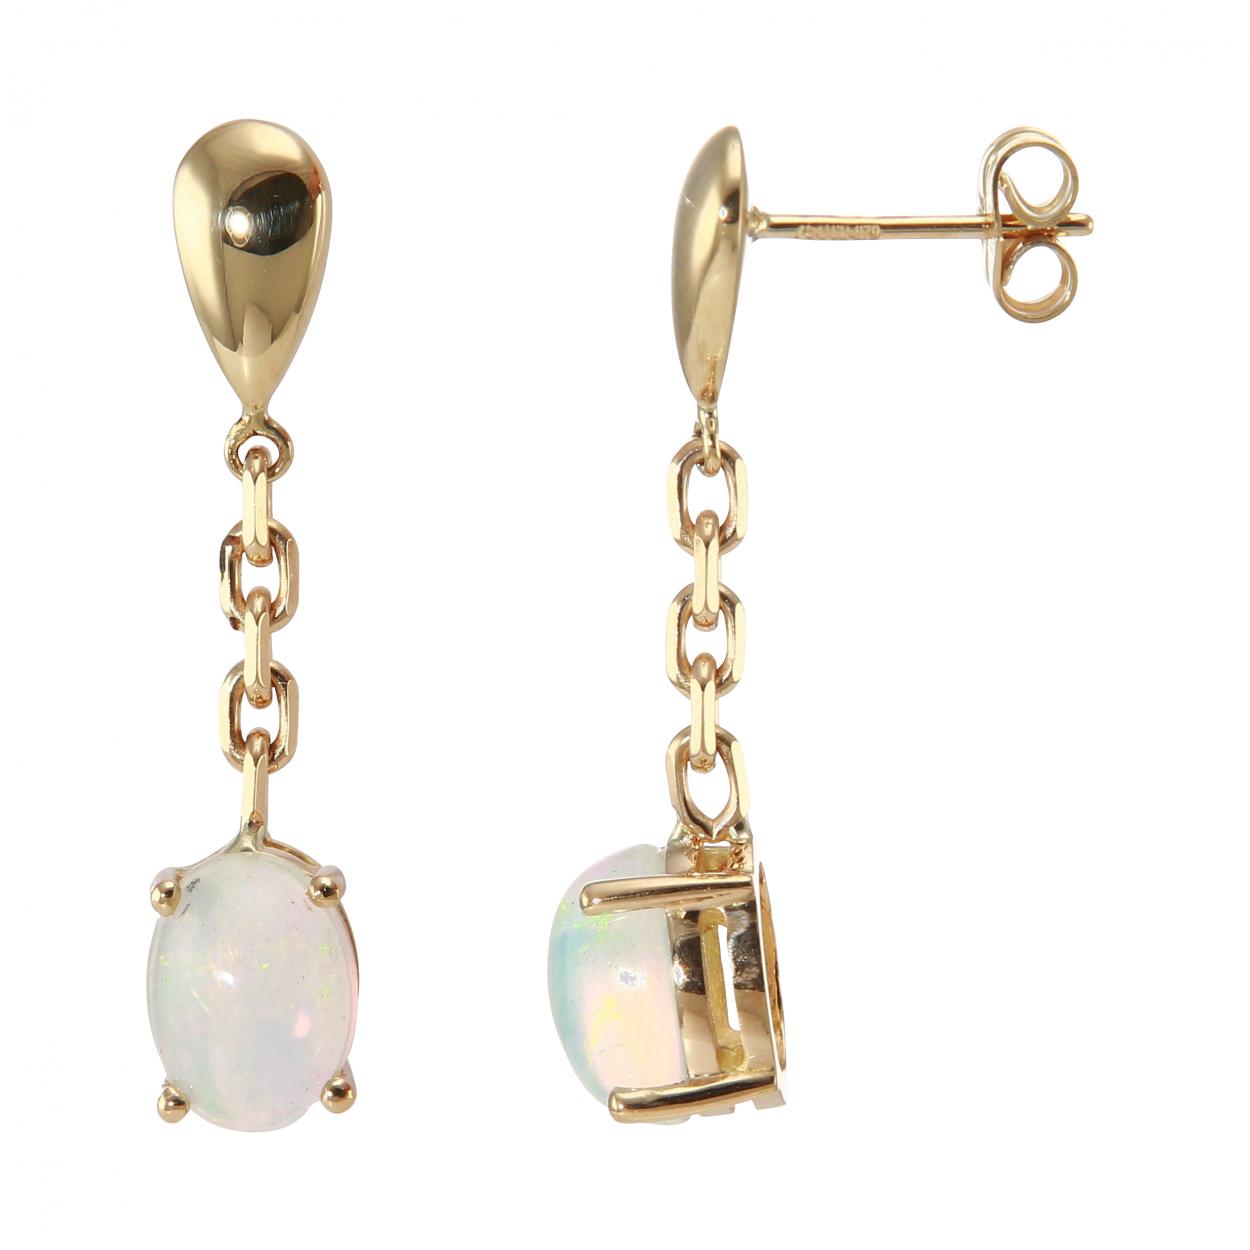 boucles d 39 oreilles pendantes or jaune opales ovales 8x6mm ref 32397. Black Bedroom Furniture Sets. Home Design Ideas